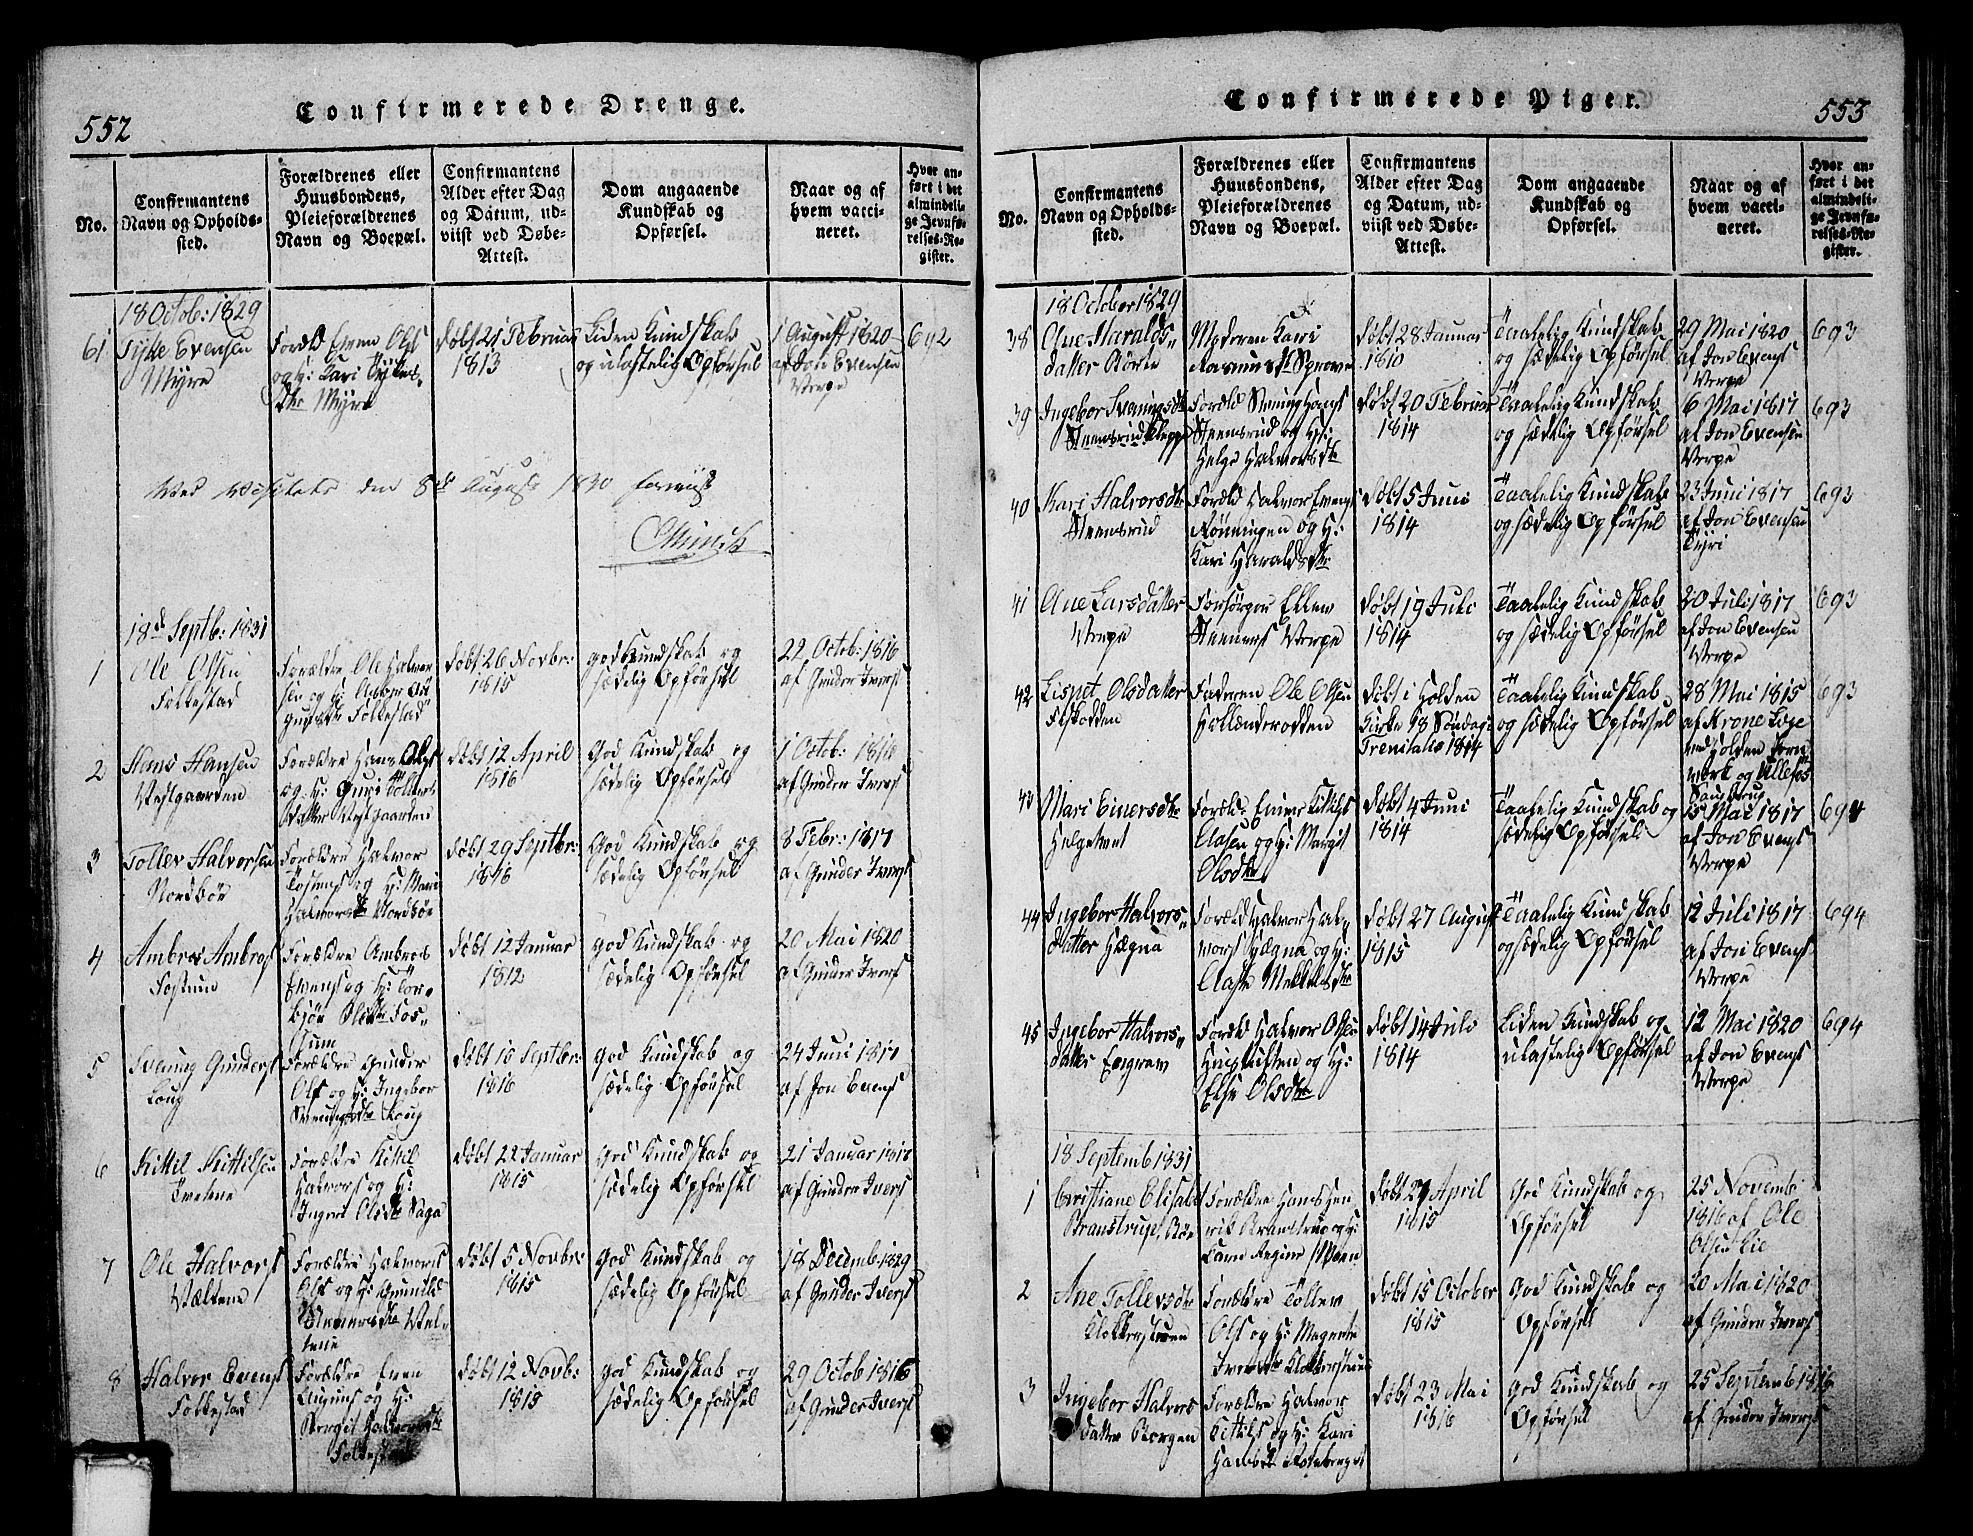 SAKO, Bø kirkebøker, G/Ga/L0001: Klokkerbok nr. 1, 1815-1831, s. 552-553